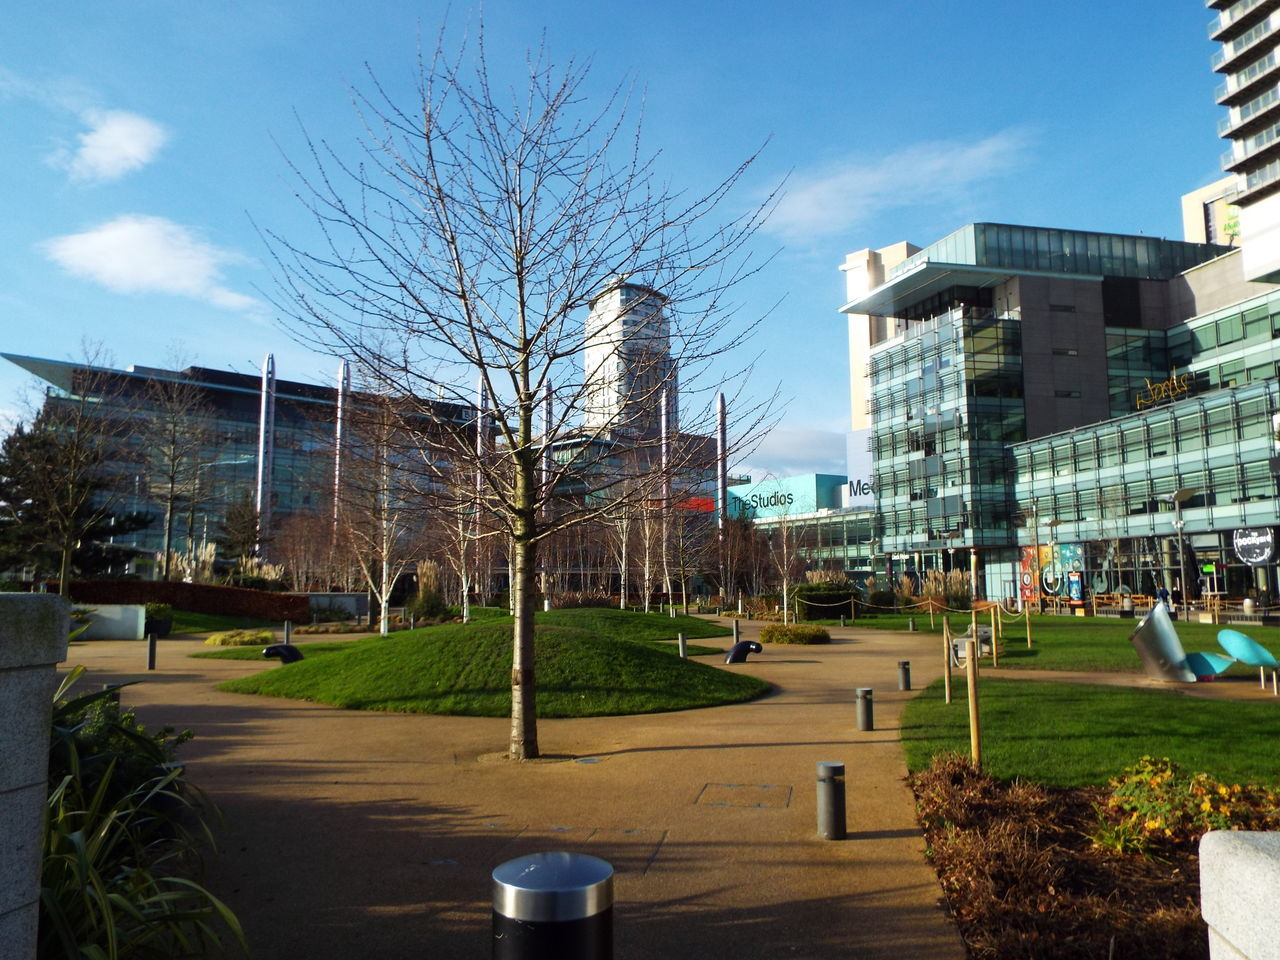 Media City Salford Salford Quays Salford United Kingdom Blue Sky Trees The City Light